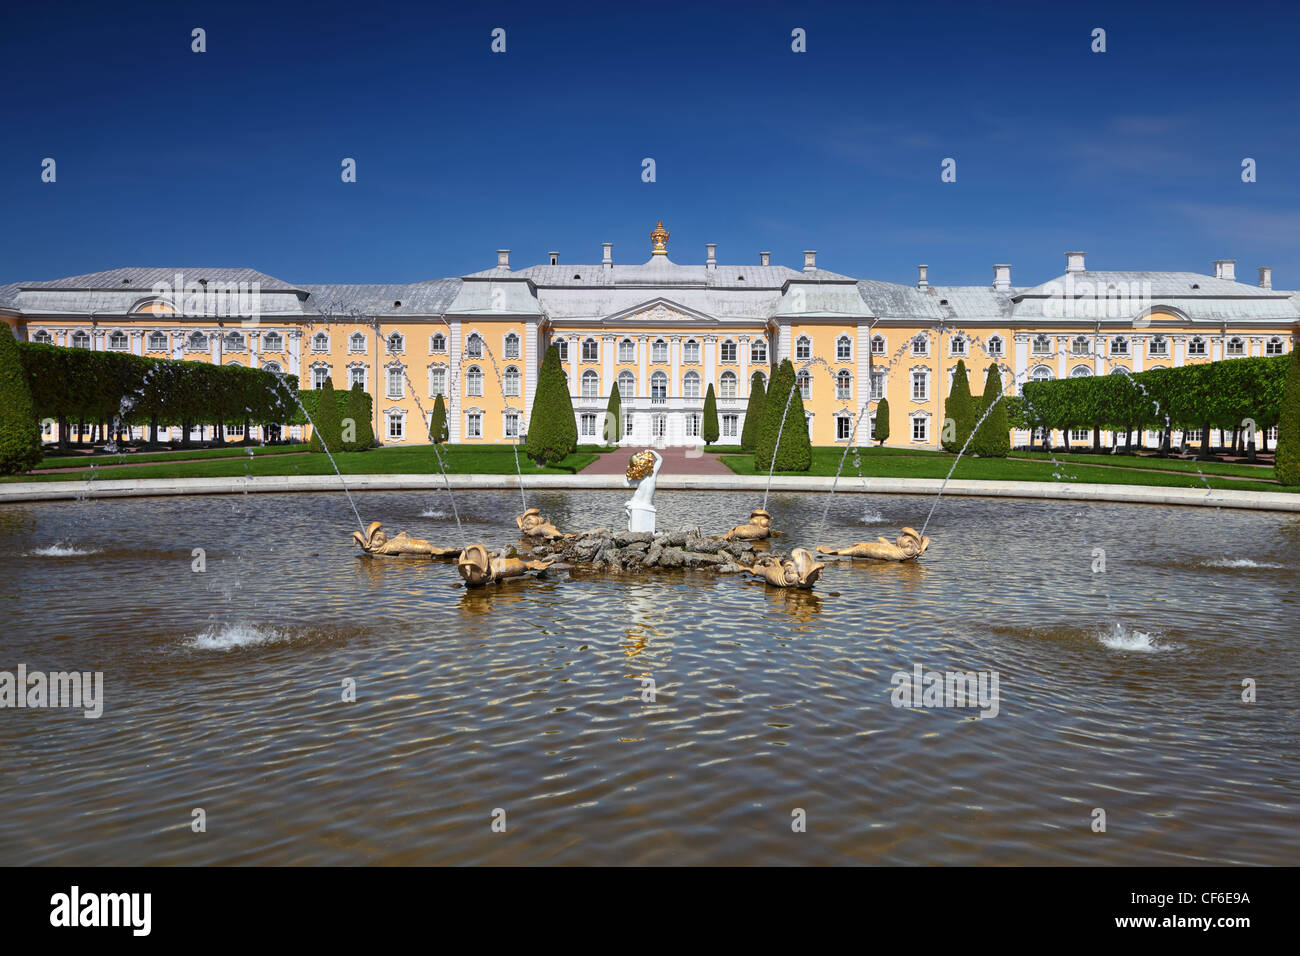 Grand Palace of Peterhof, fountain Oak  Saint-Petersburg, Russia - Stock Image